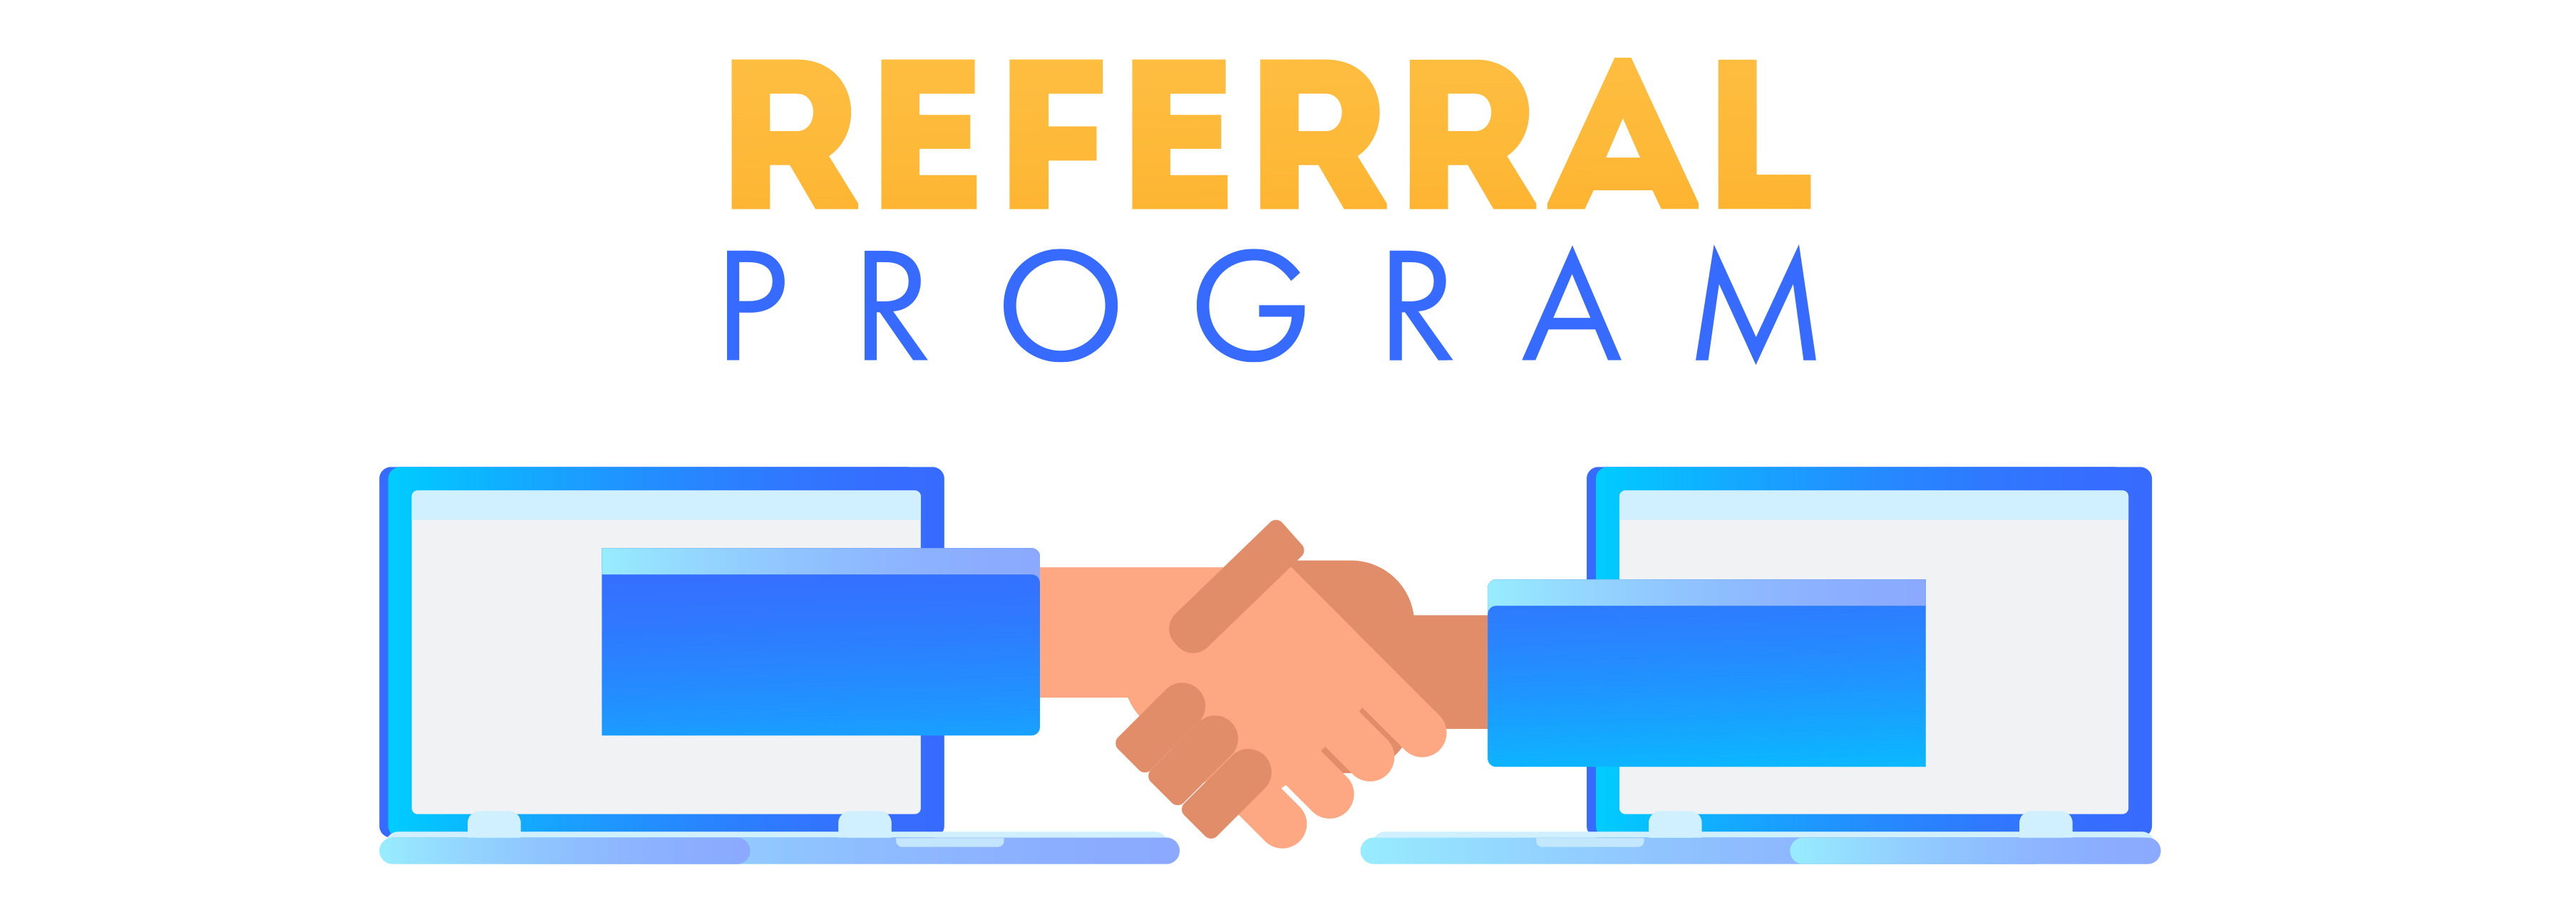 Referral Program Illustration